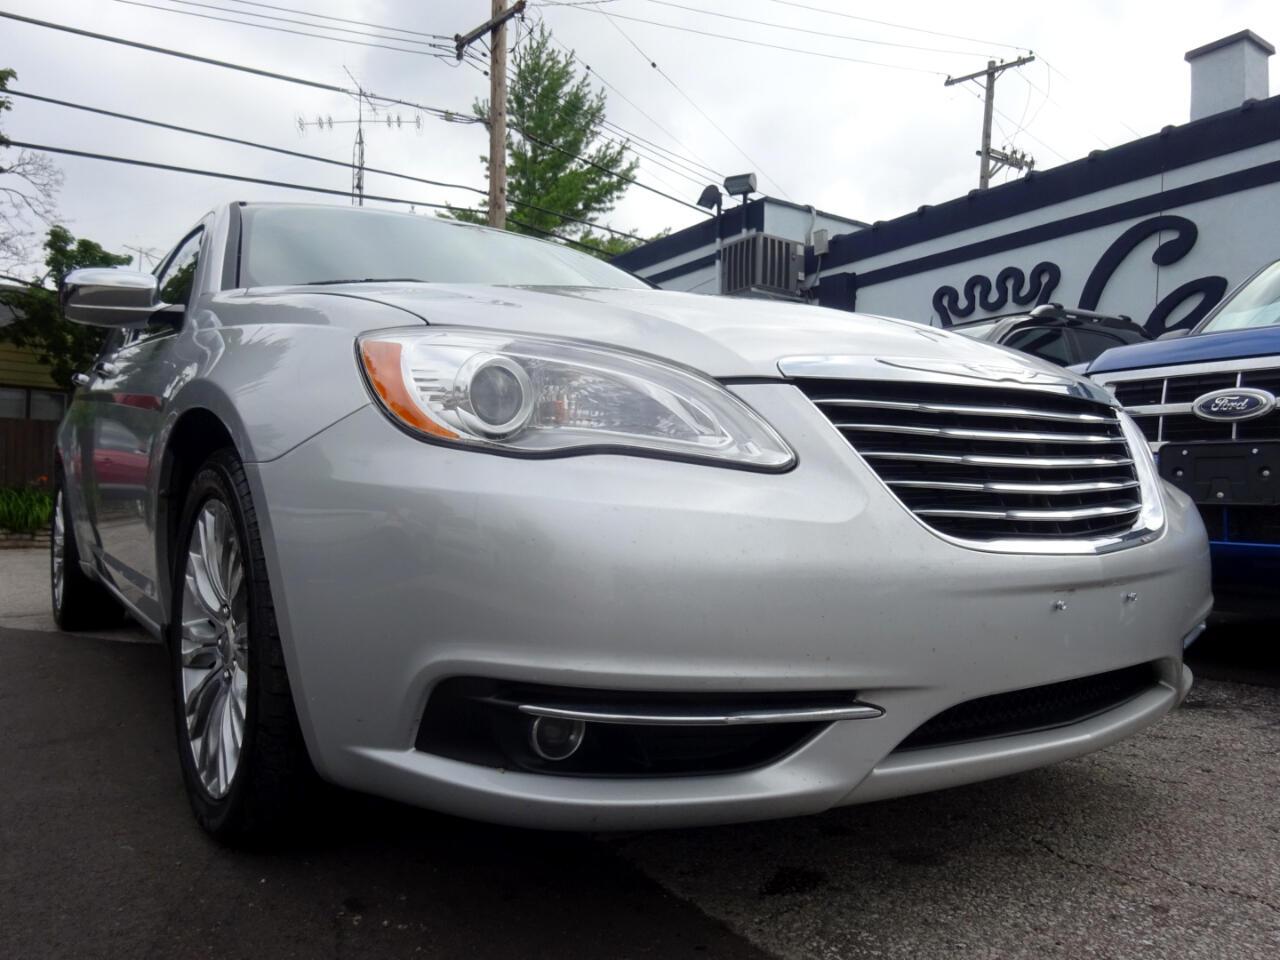 Chrysler 200 4dr Sdn Limited 2012